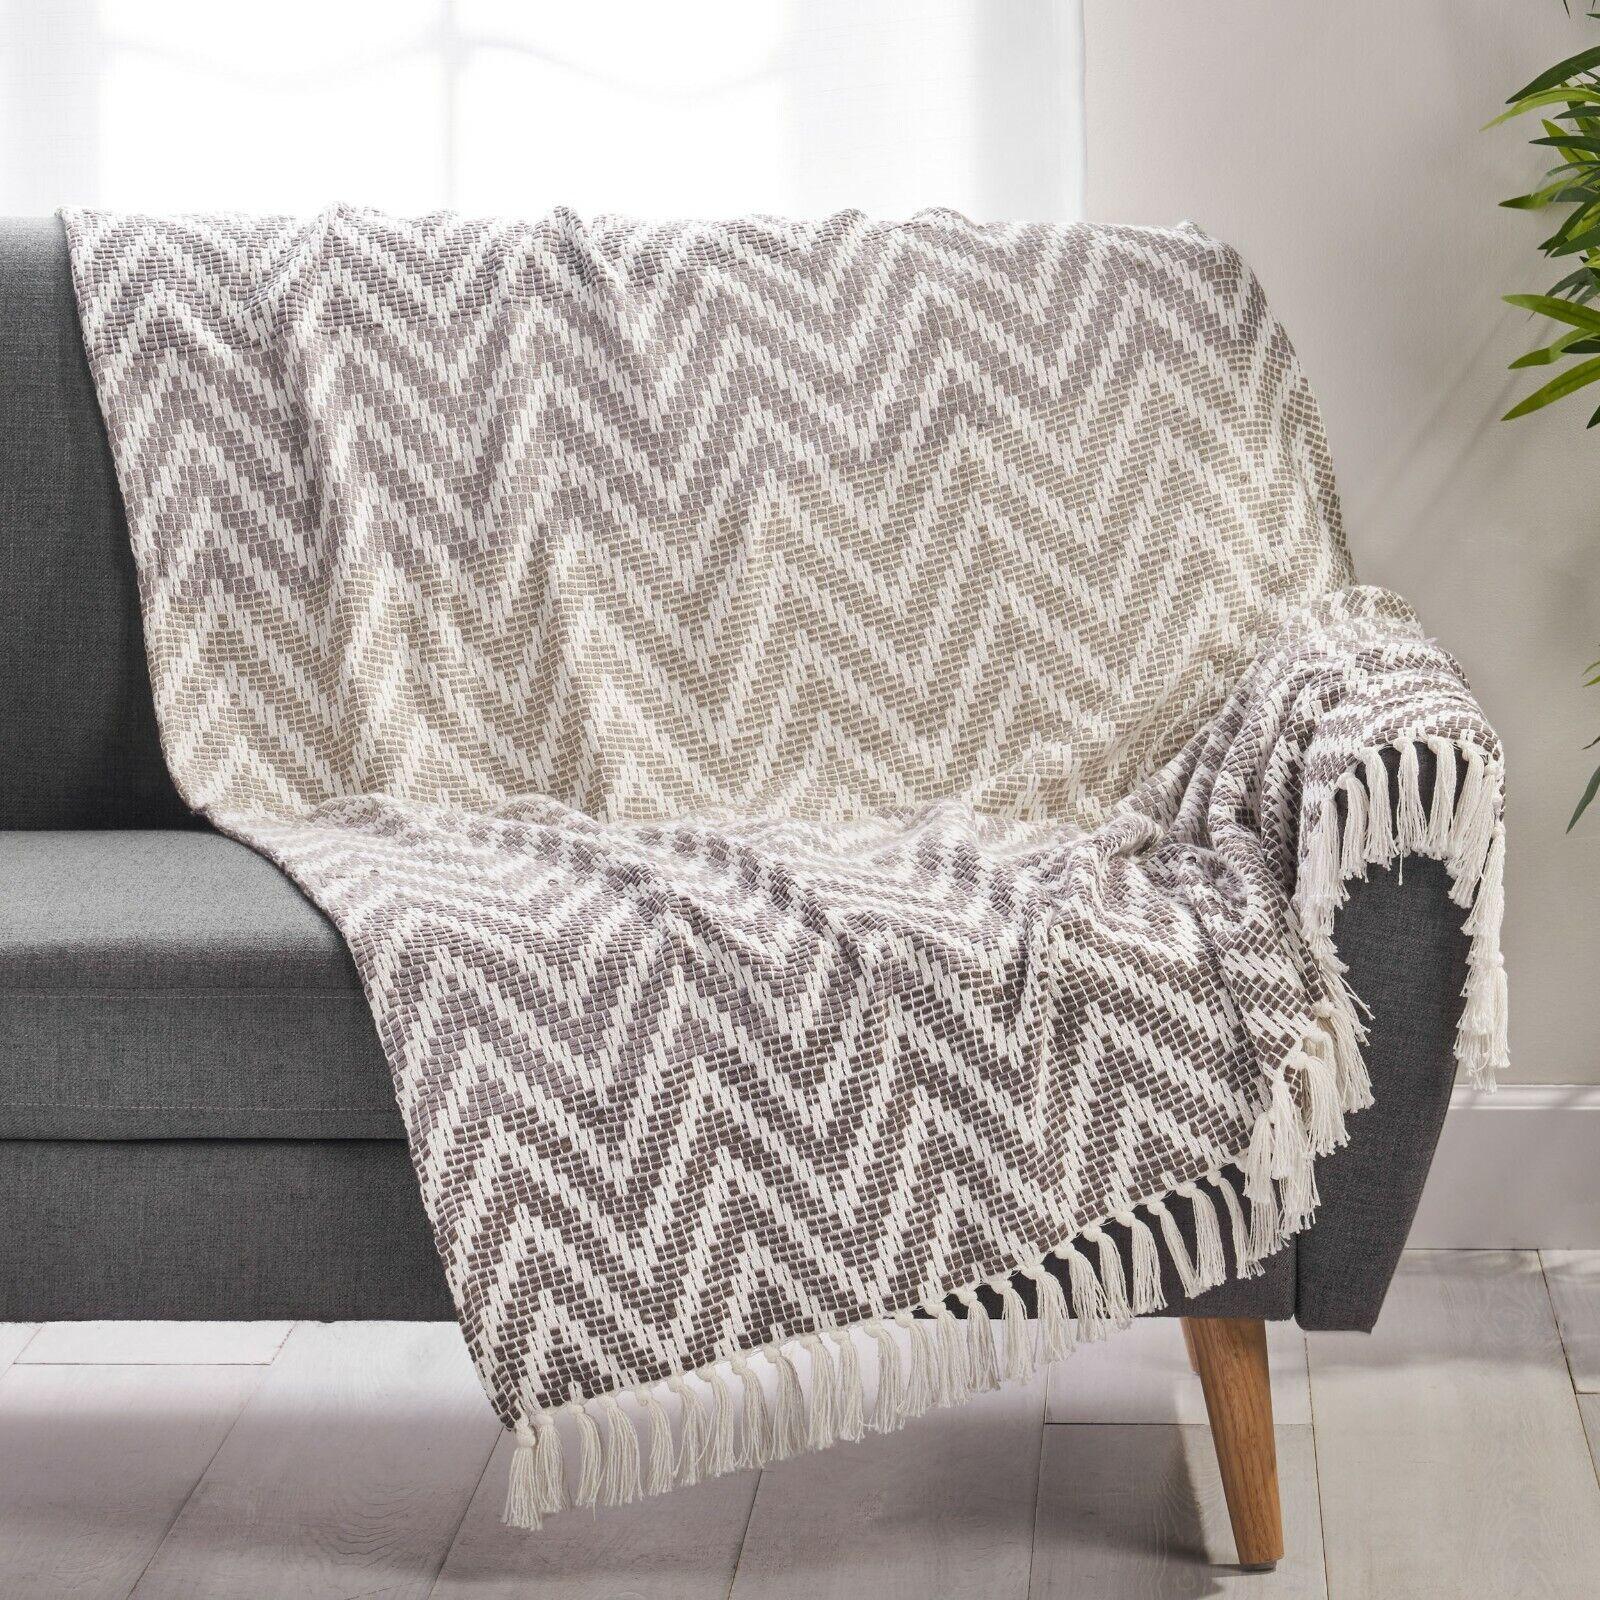 Raylinn Boho Fabric Throw Blanket Bedding